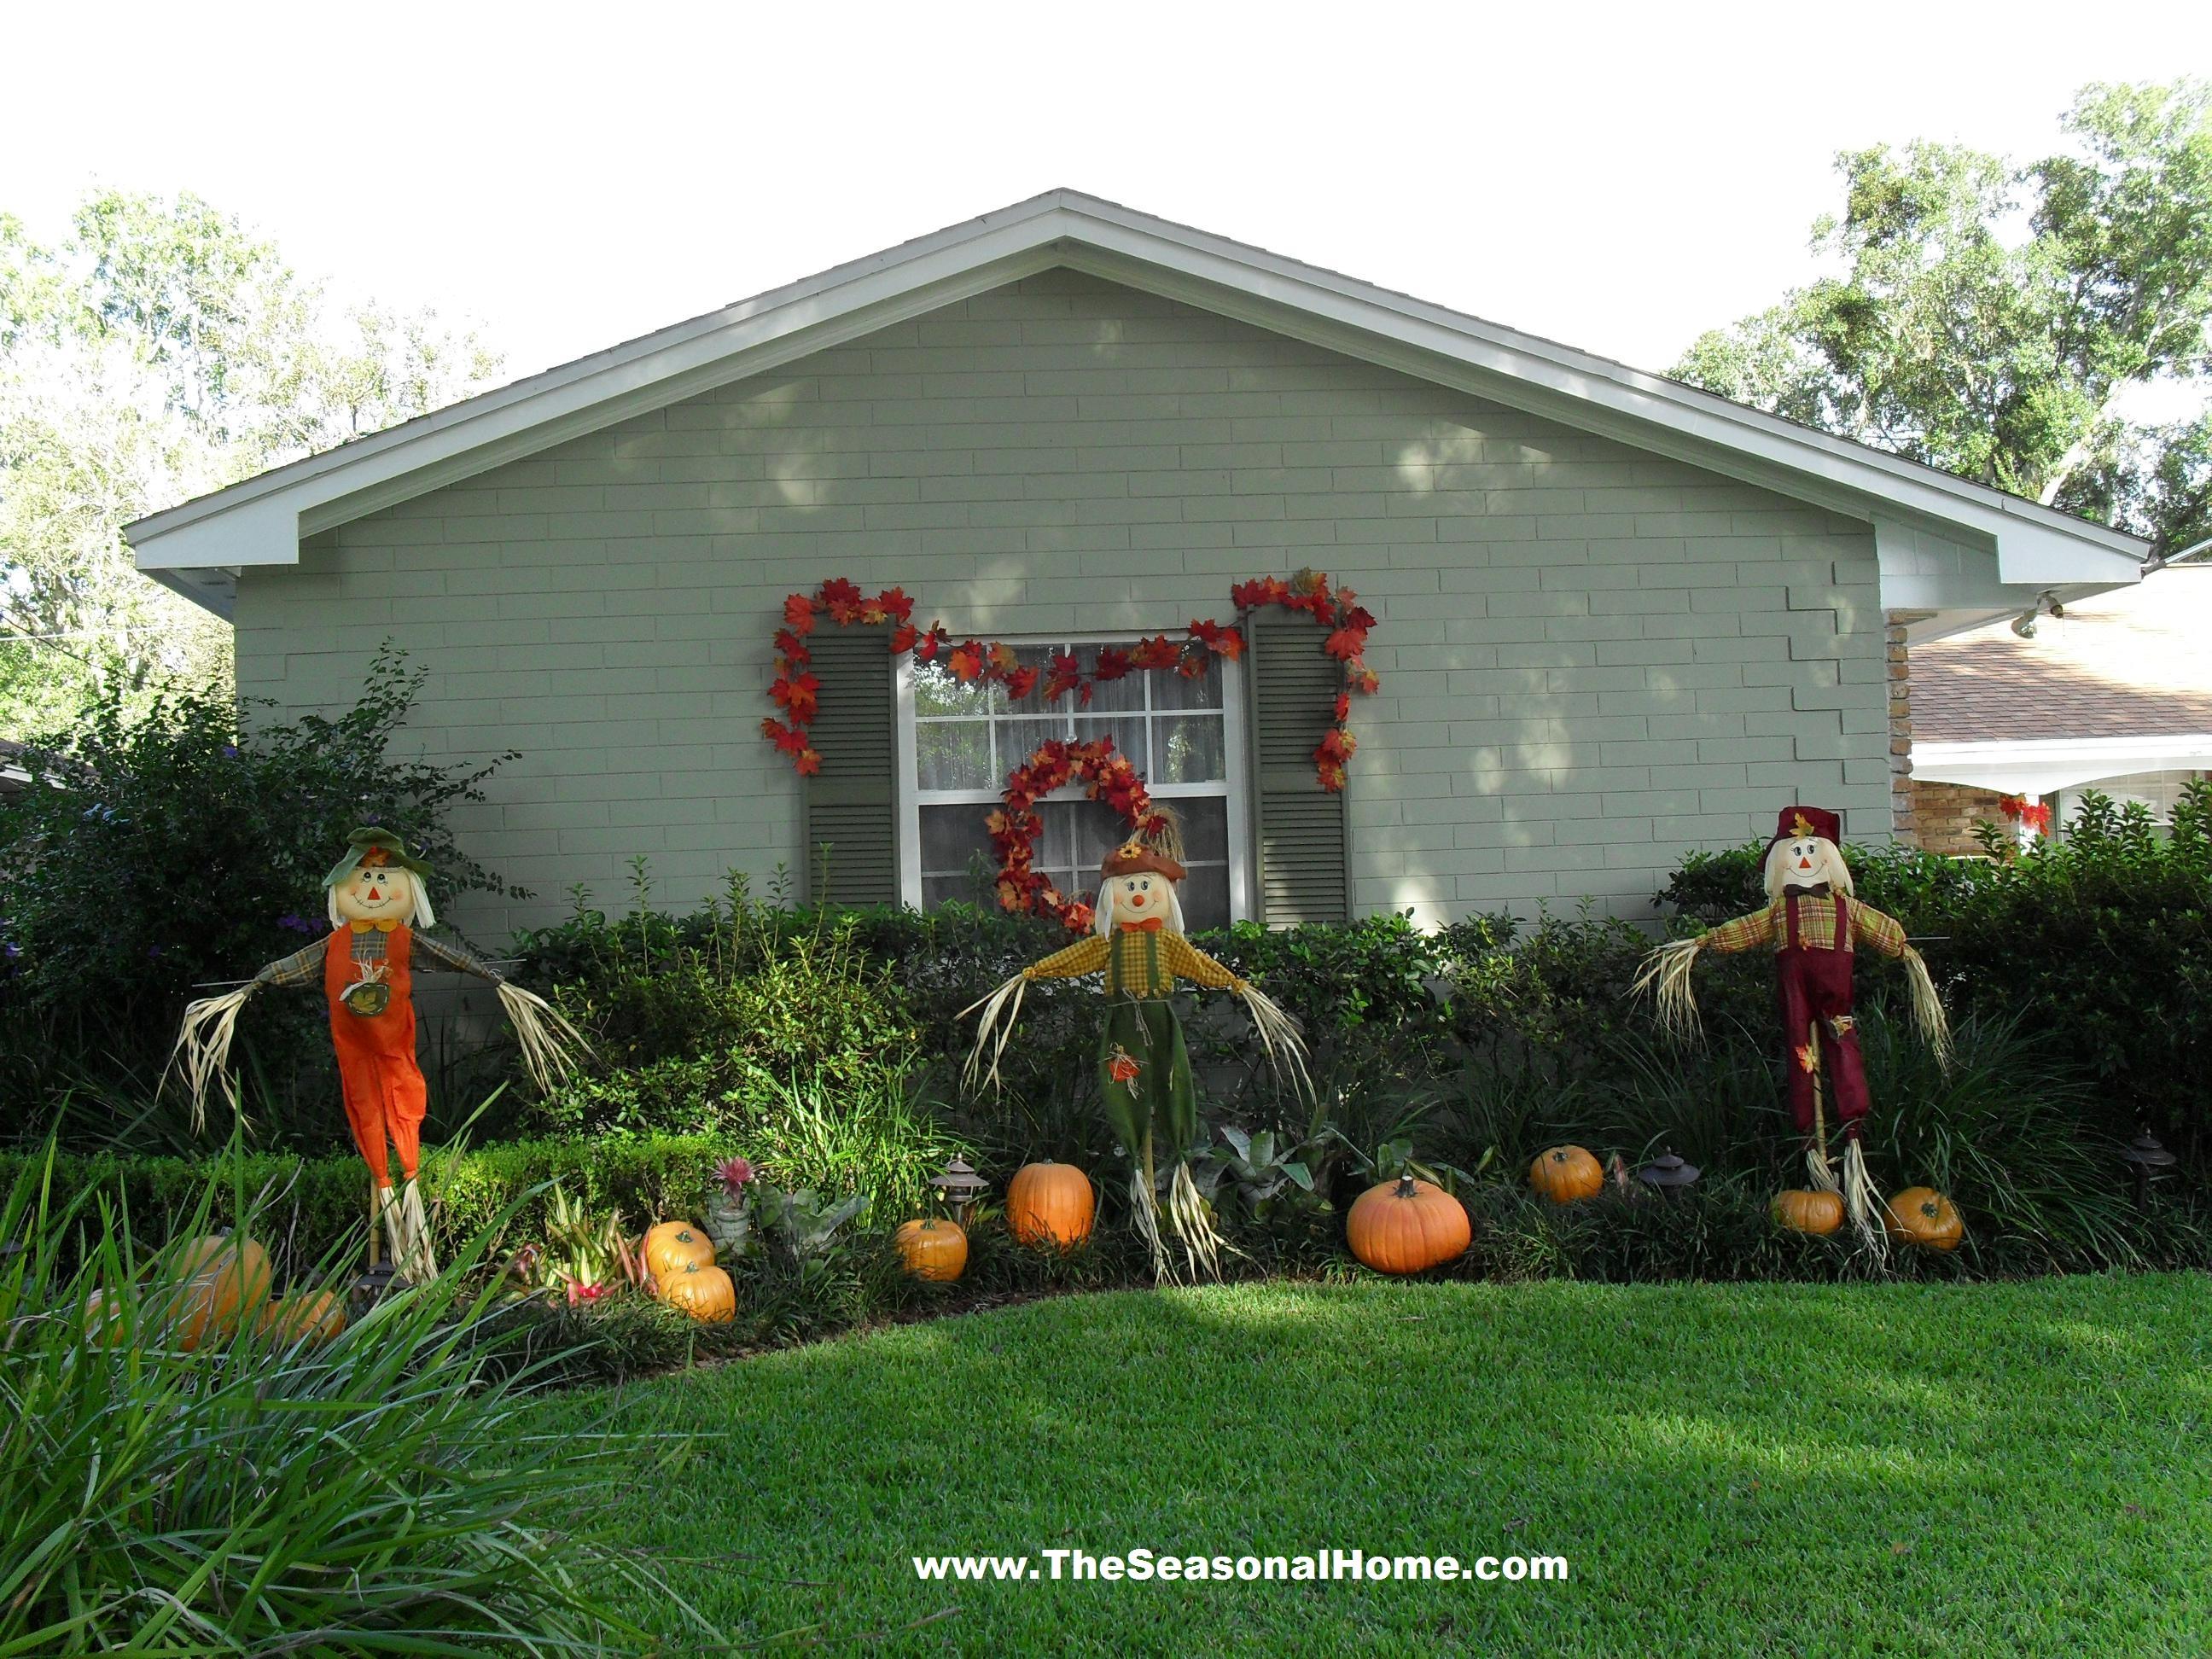 FALL YARD DECORATION IDEAS « The Seasonal Home on Lawn Decorating Ideas id=23415